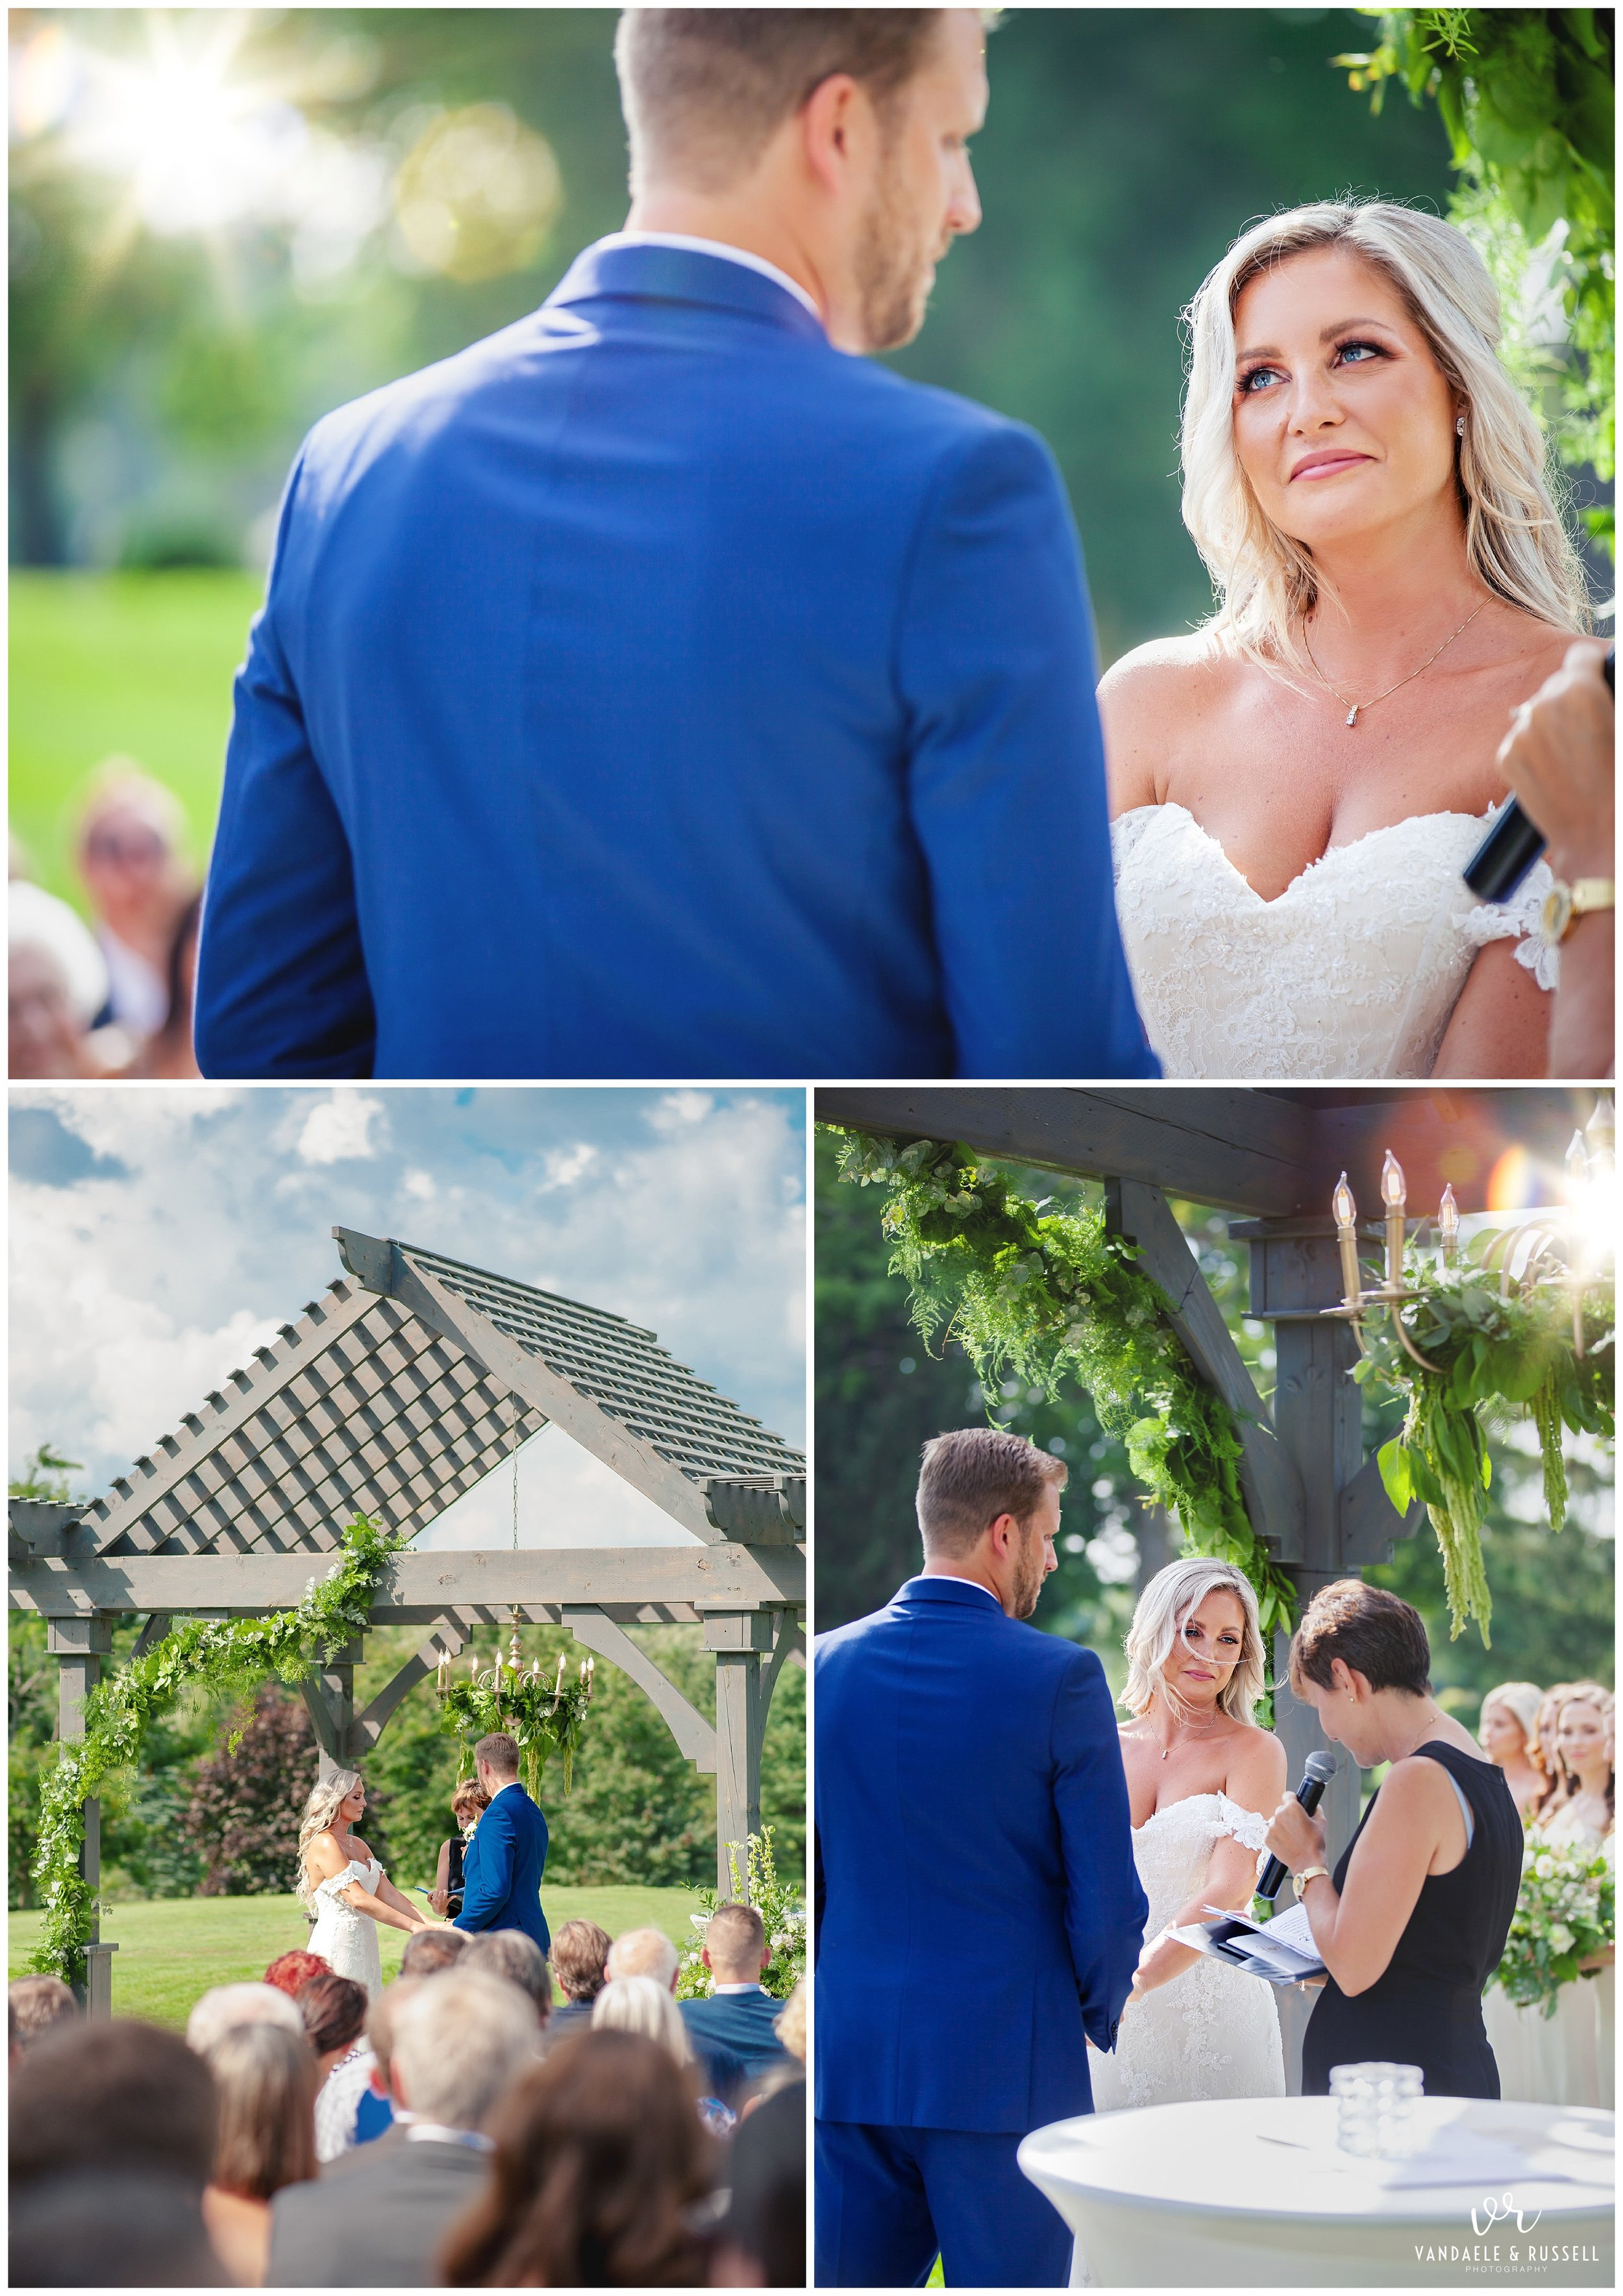 VanDaele-Russell-Wedding-Photography-London-Toronto-Ontario_0166.jpg